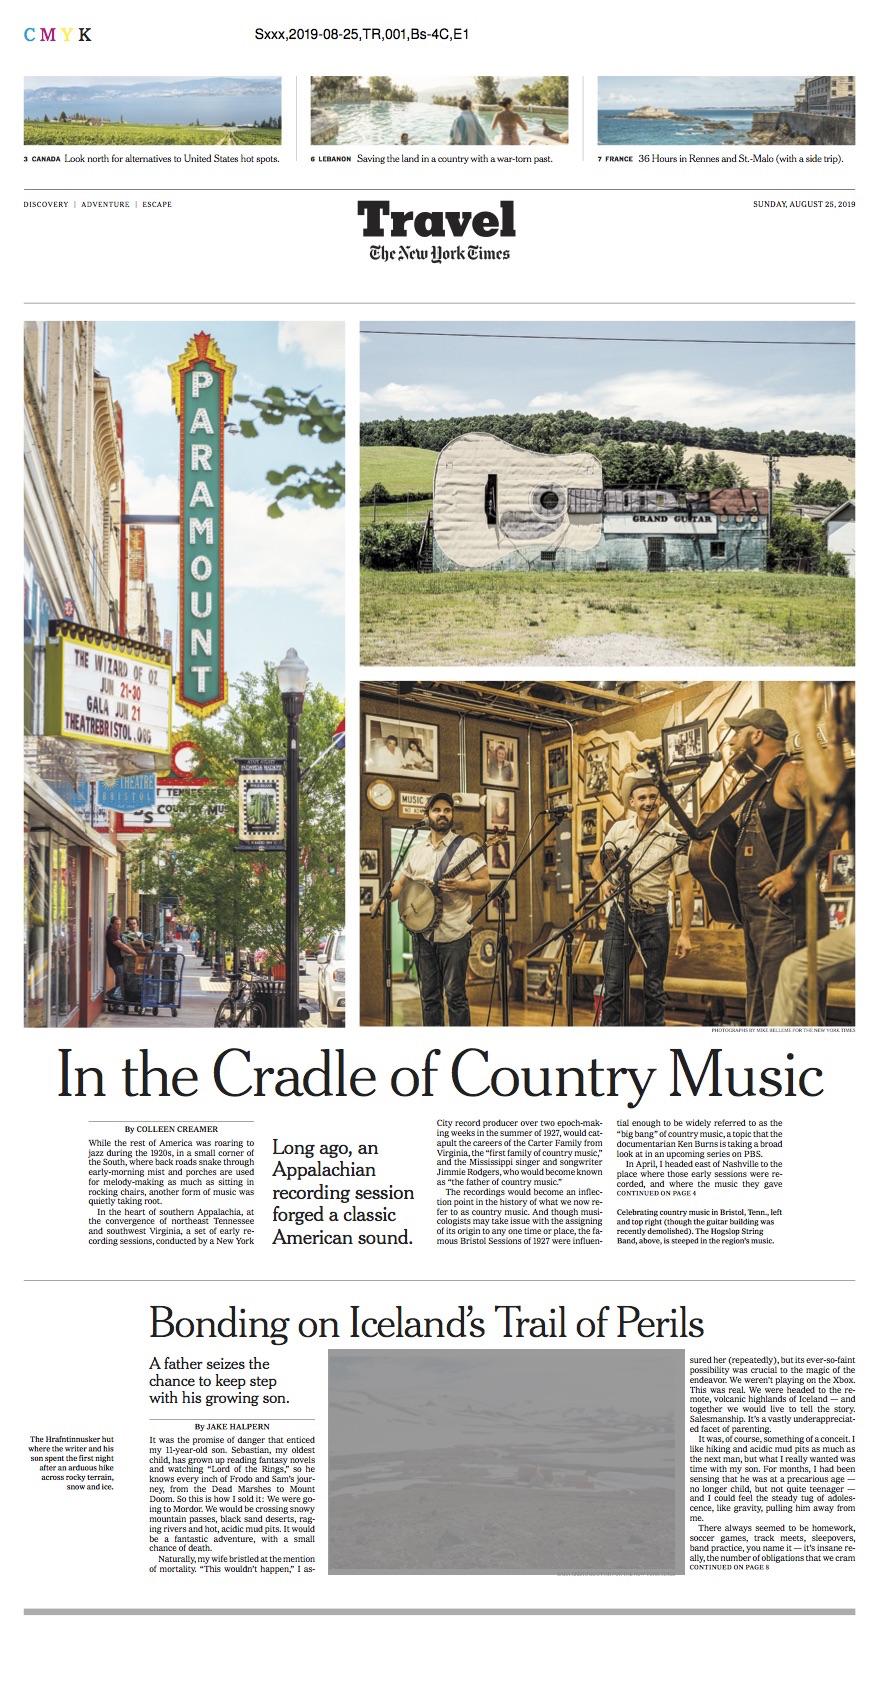 The New York Times / Kasia Strek